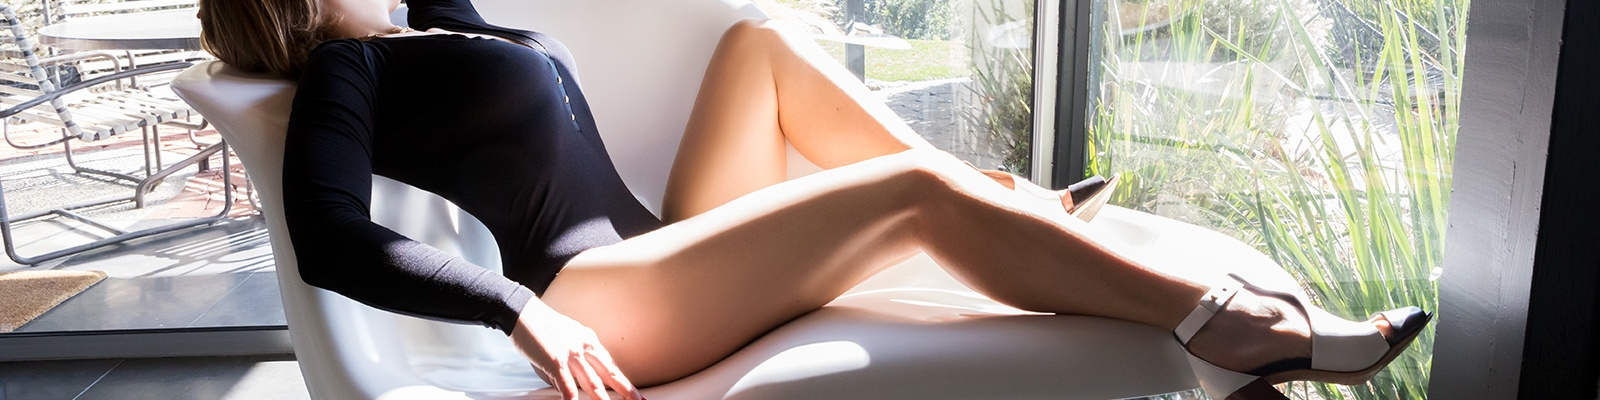 Chloé Lea's Cover Photo